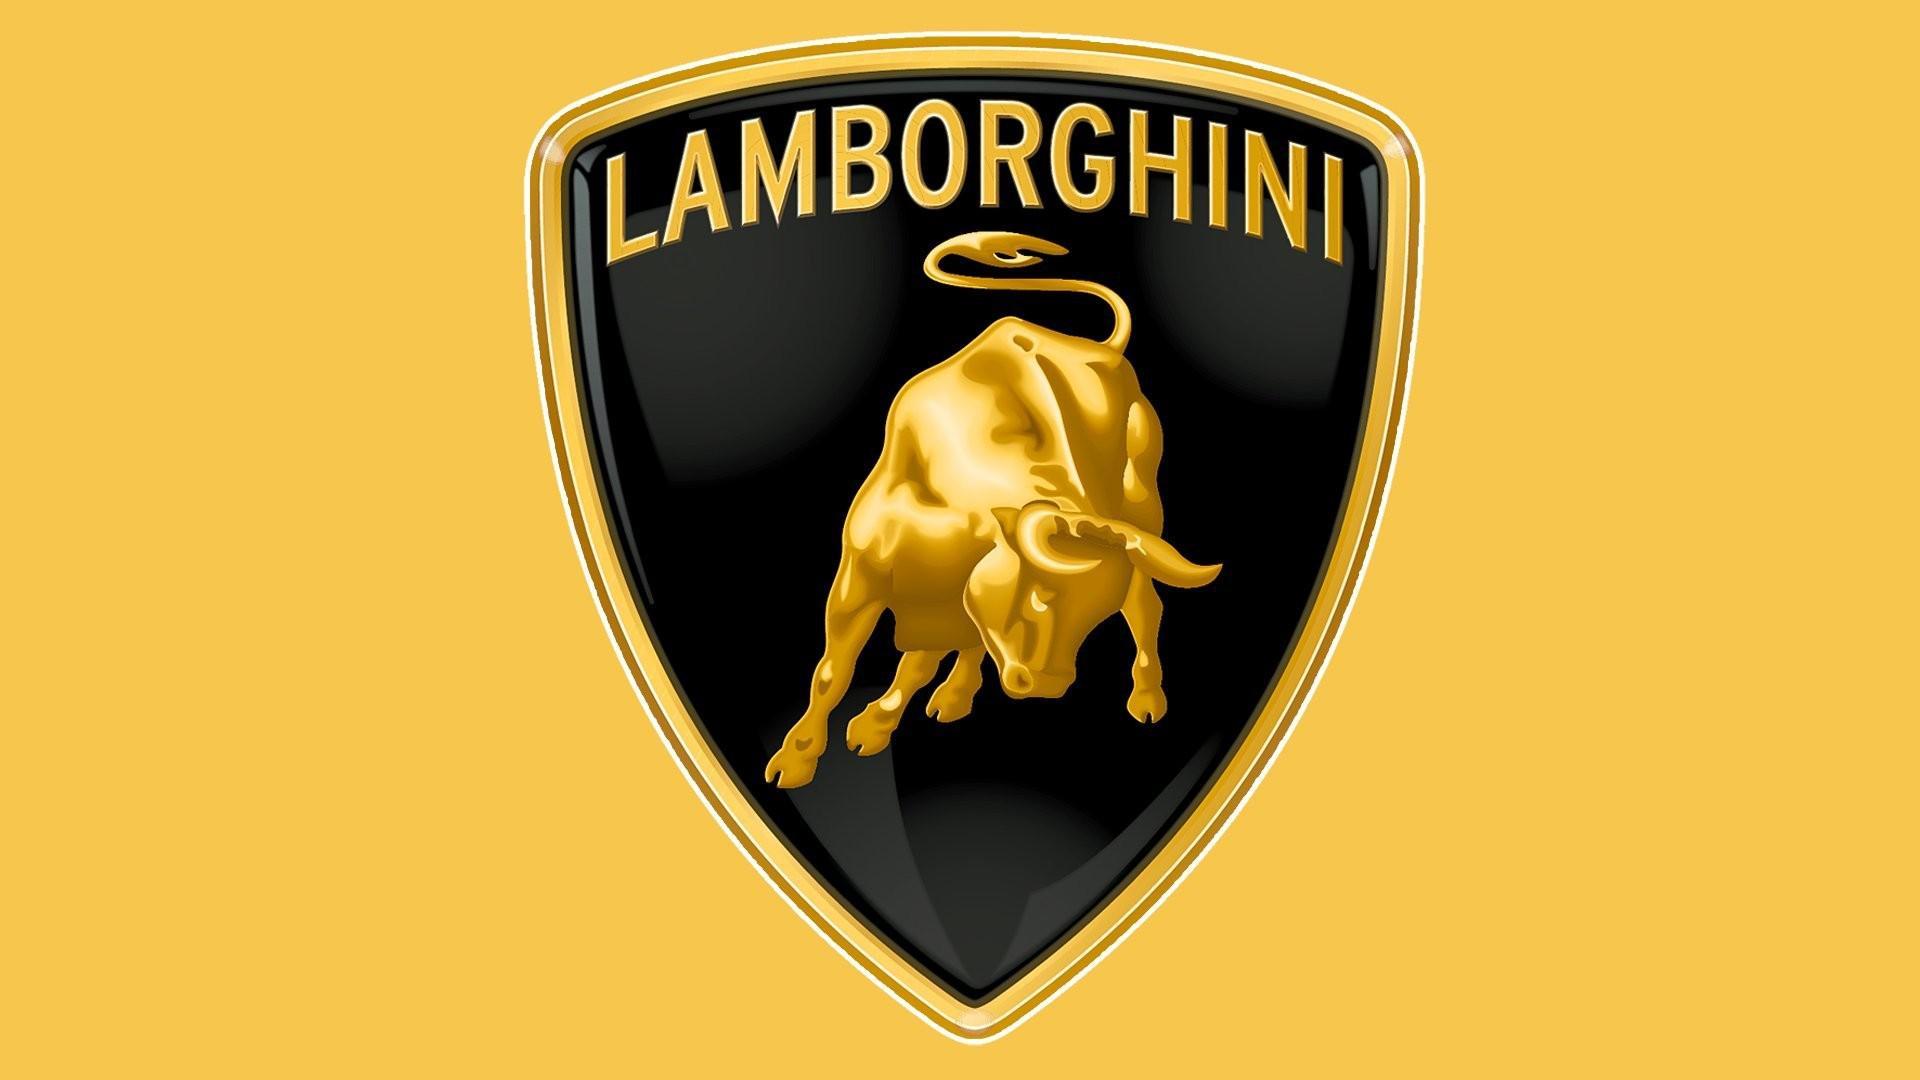 Exclu: À savoir concernant la marque Lamborghini …